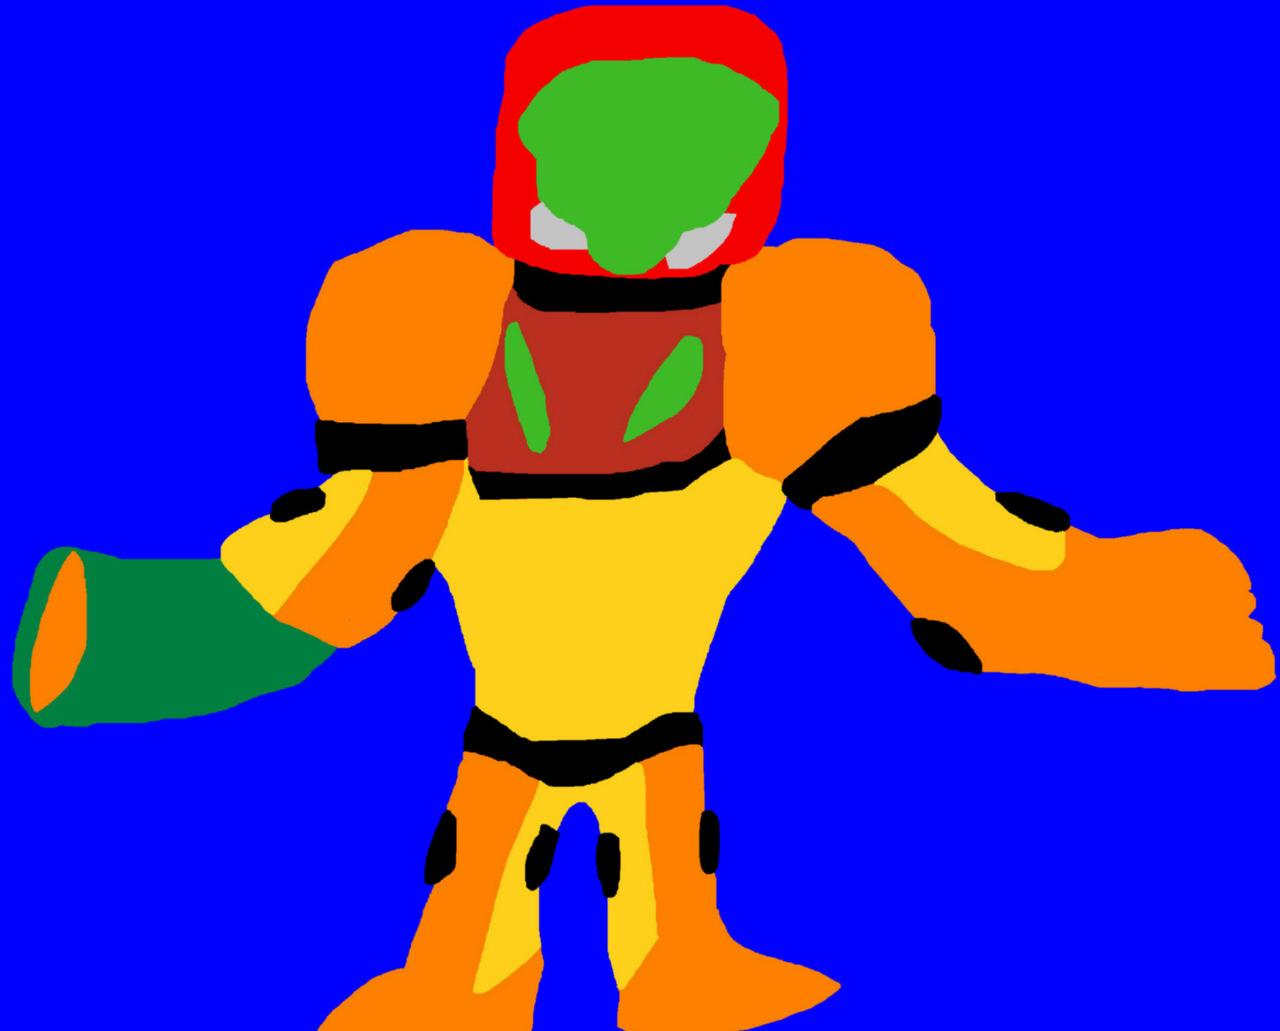 Chibi Samus Aran's Power Suit MS Paint Request For Lok8898 Of  Furaffinity by Falconlobo